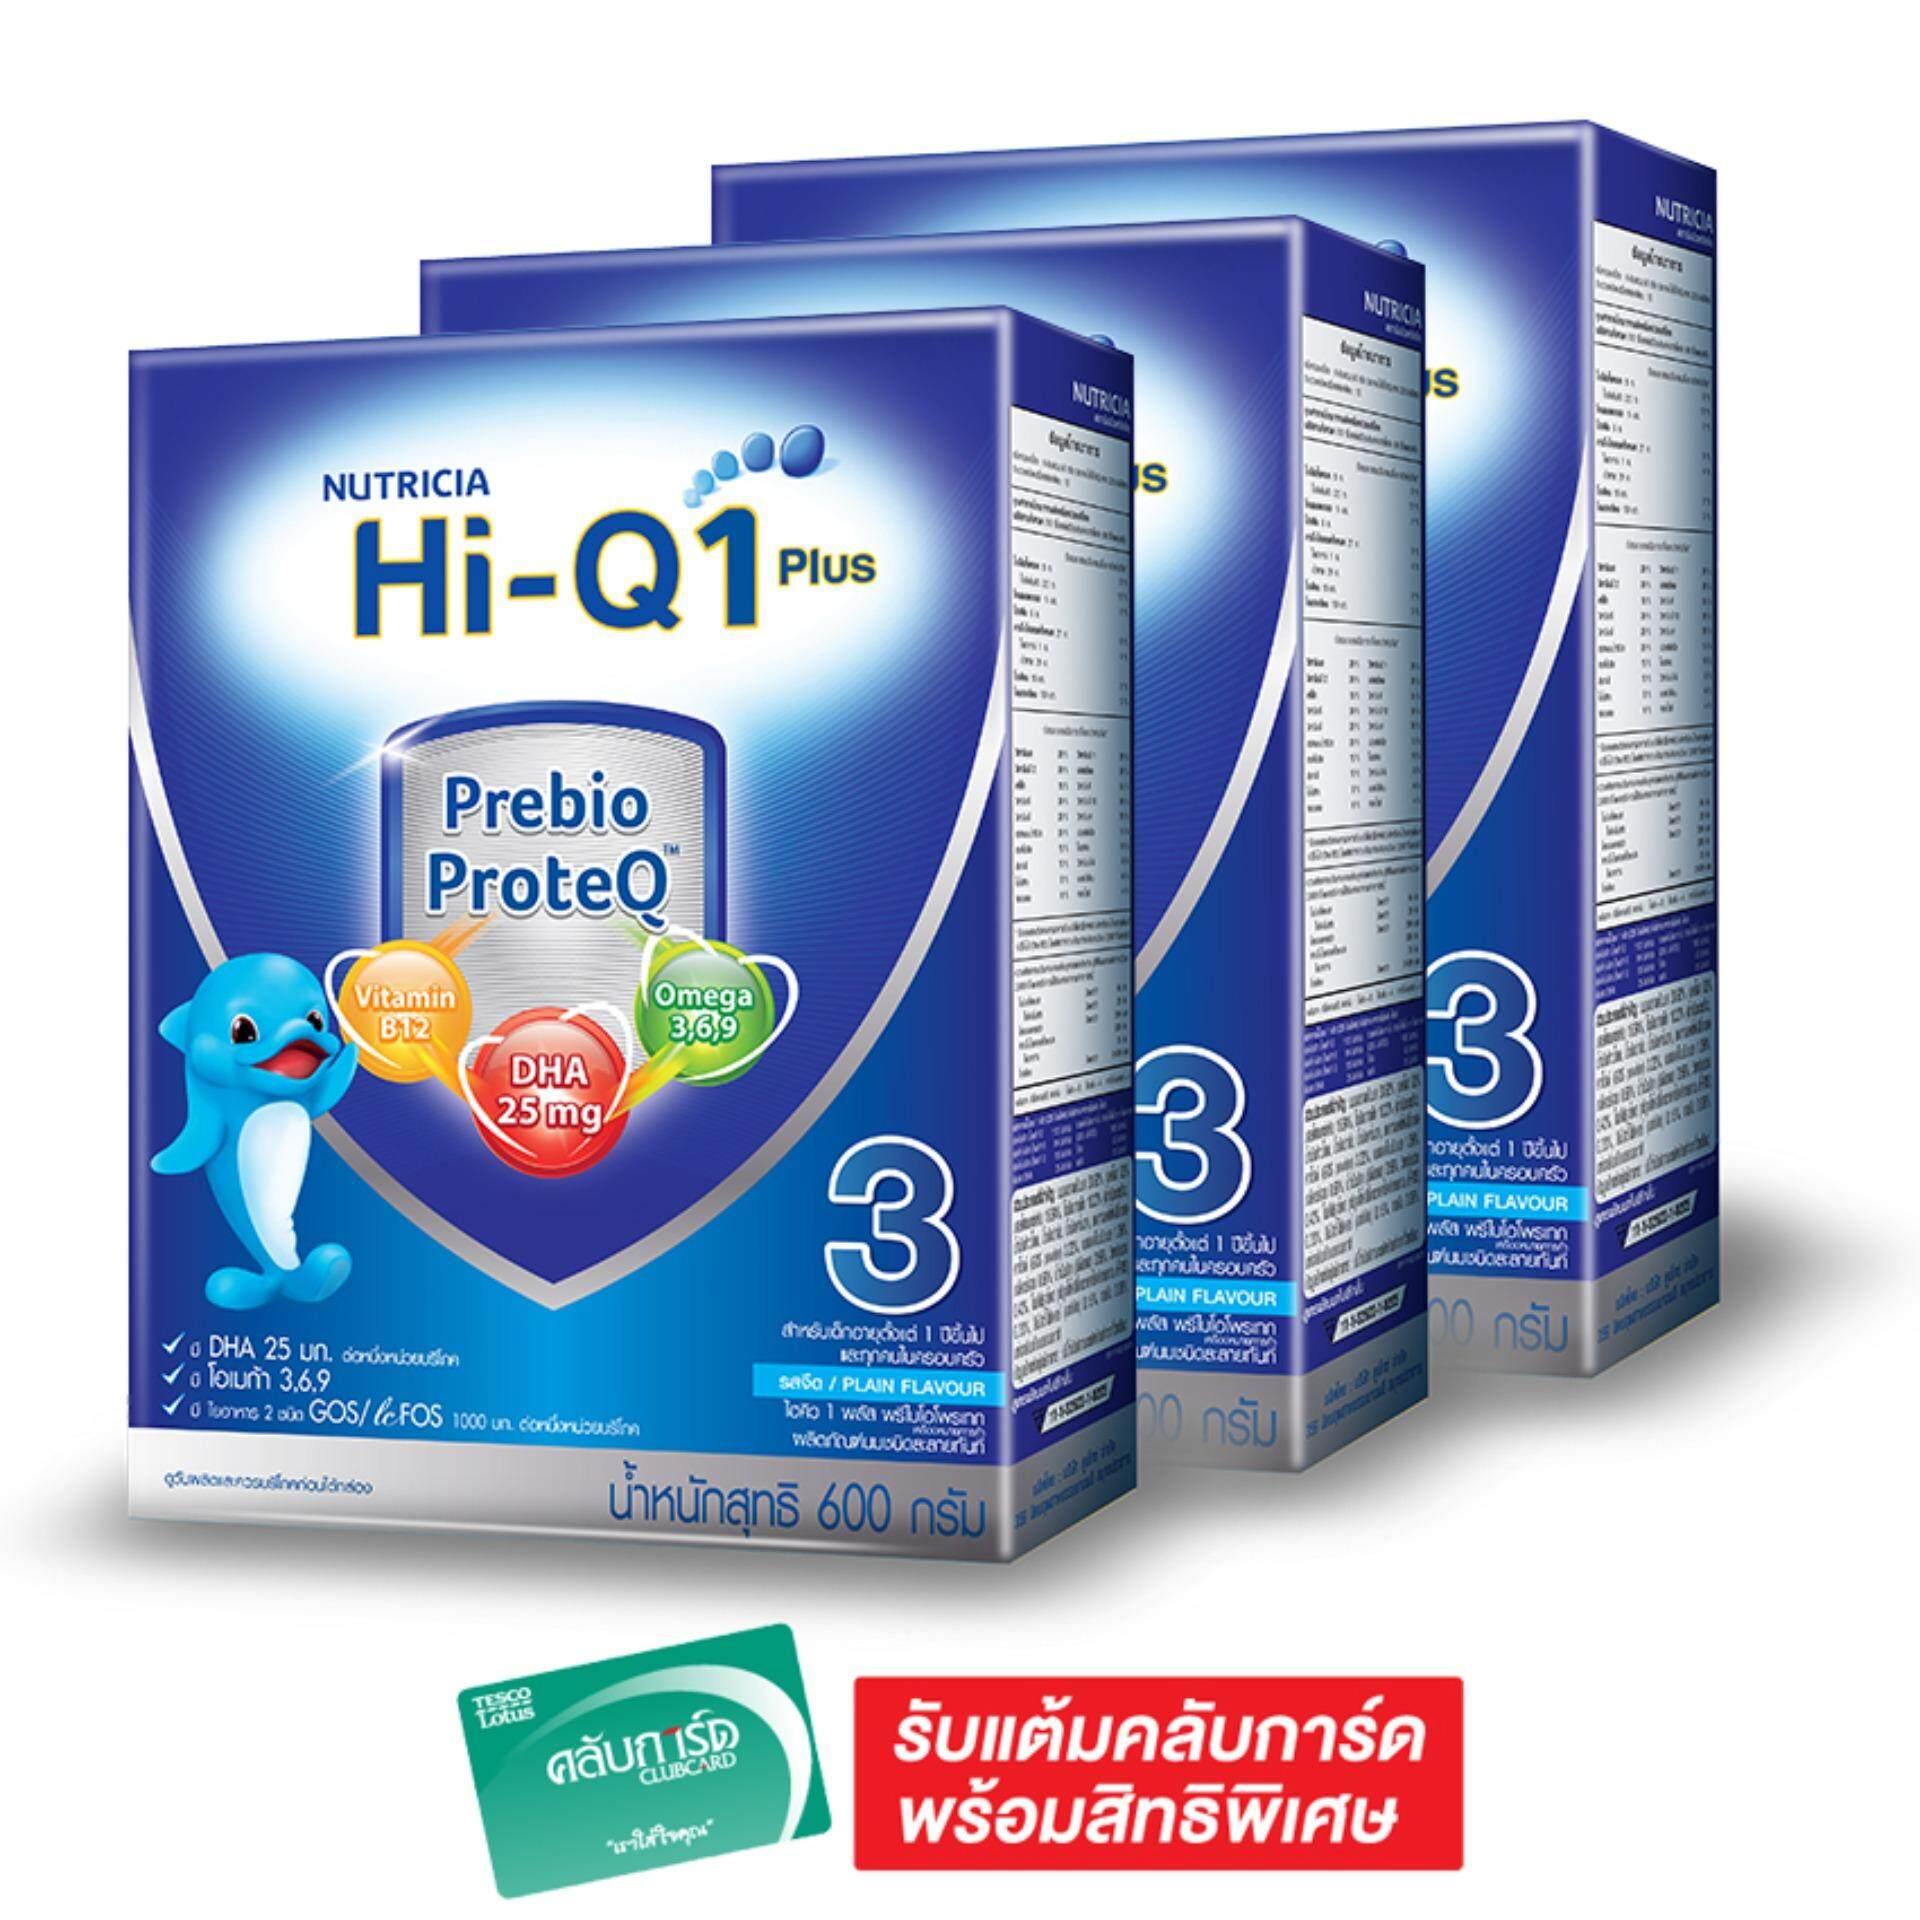 HI-Q ไฮคิว นมผง1พลัส พรีไบโอโพรเทก ช่วงวัยที่ 3รสจืด600กรัม (แพ็ค3กล่อง)